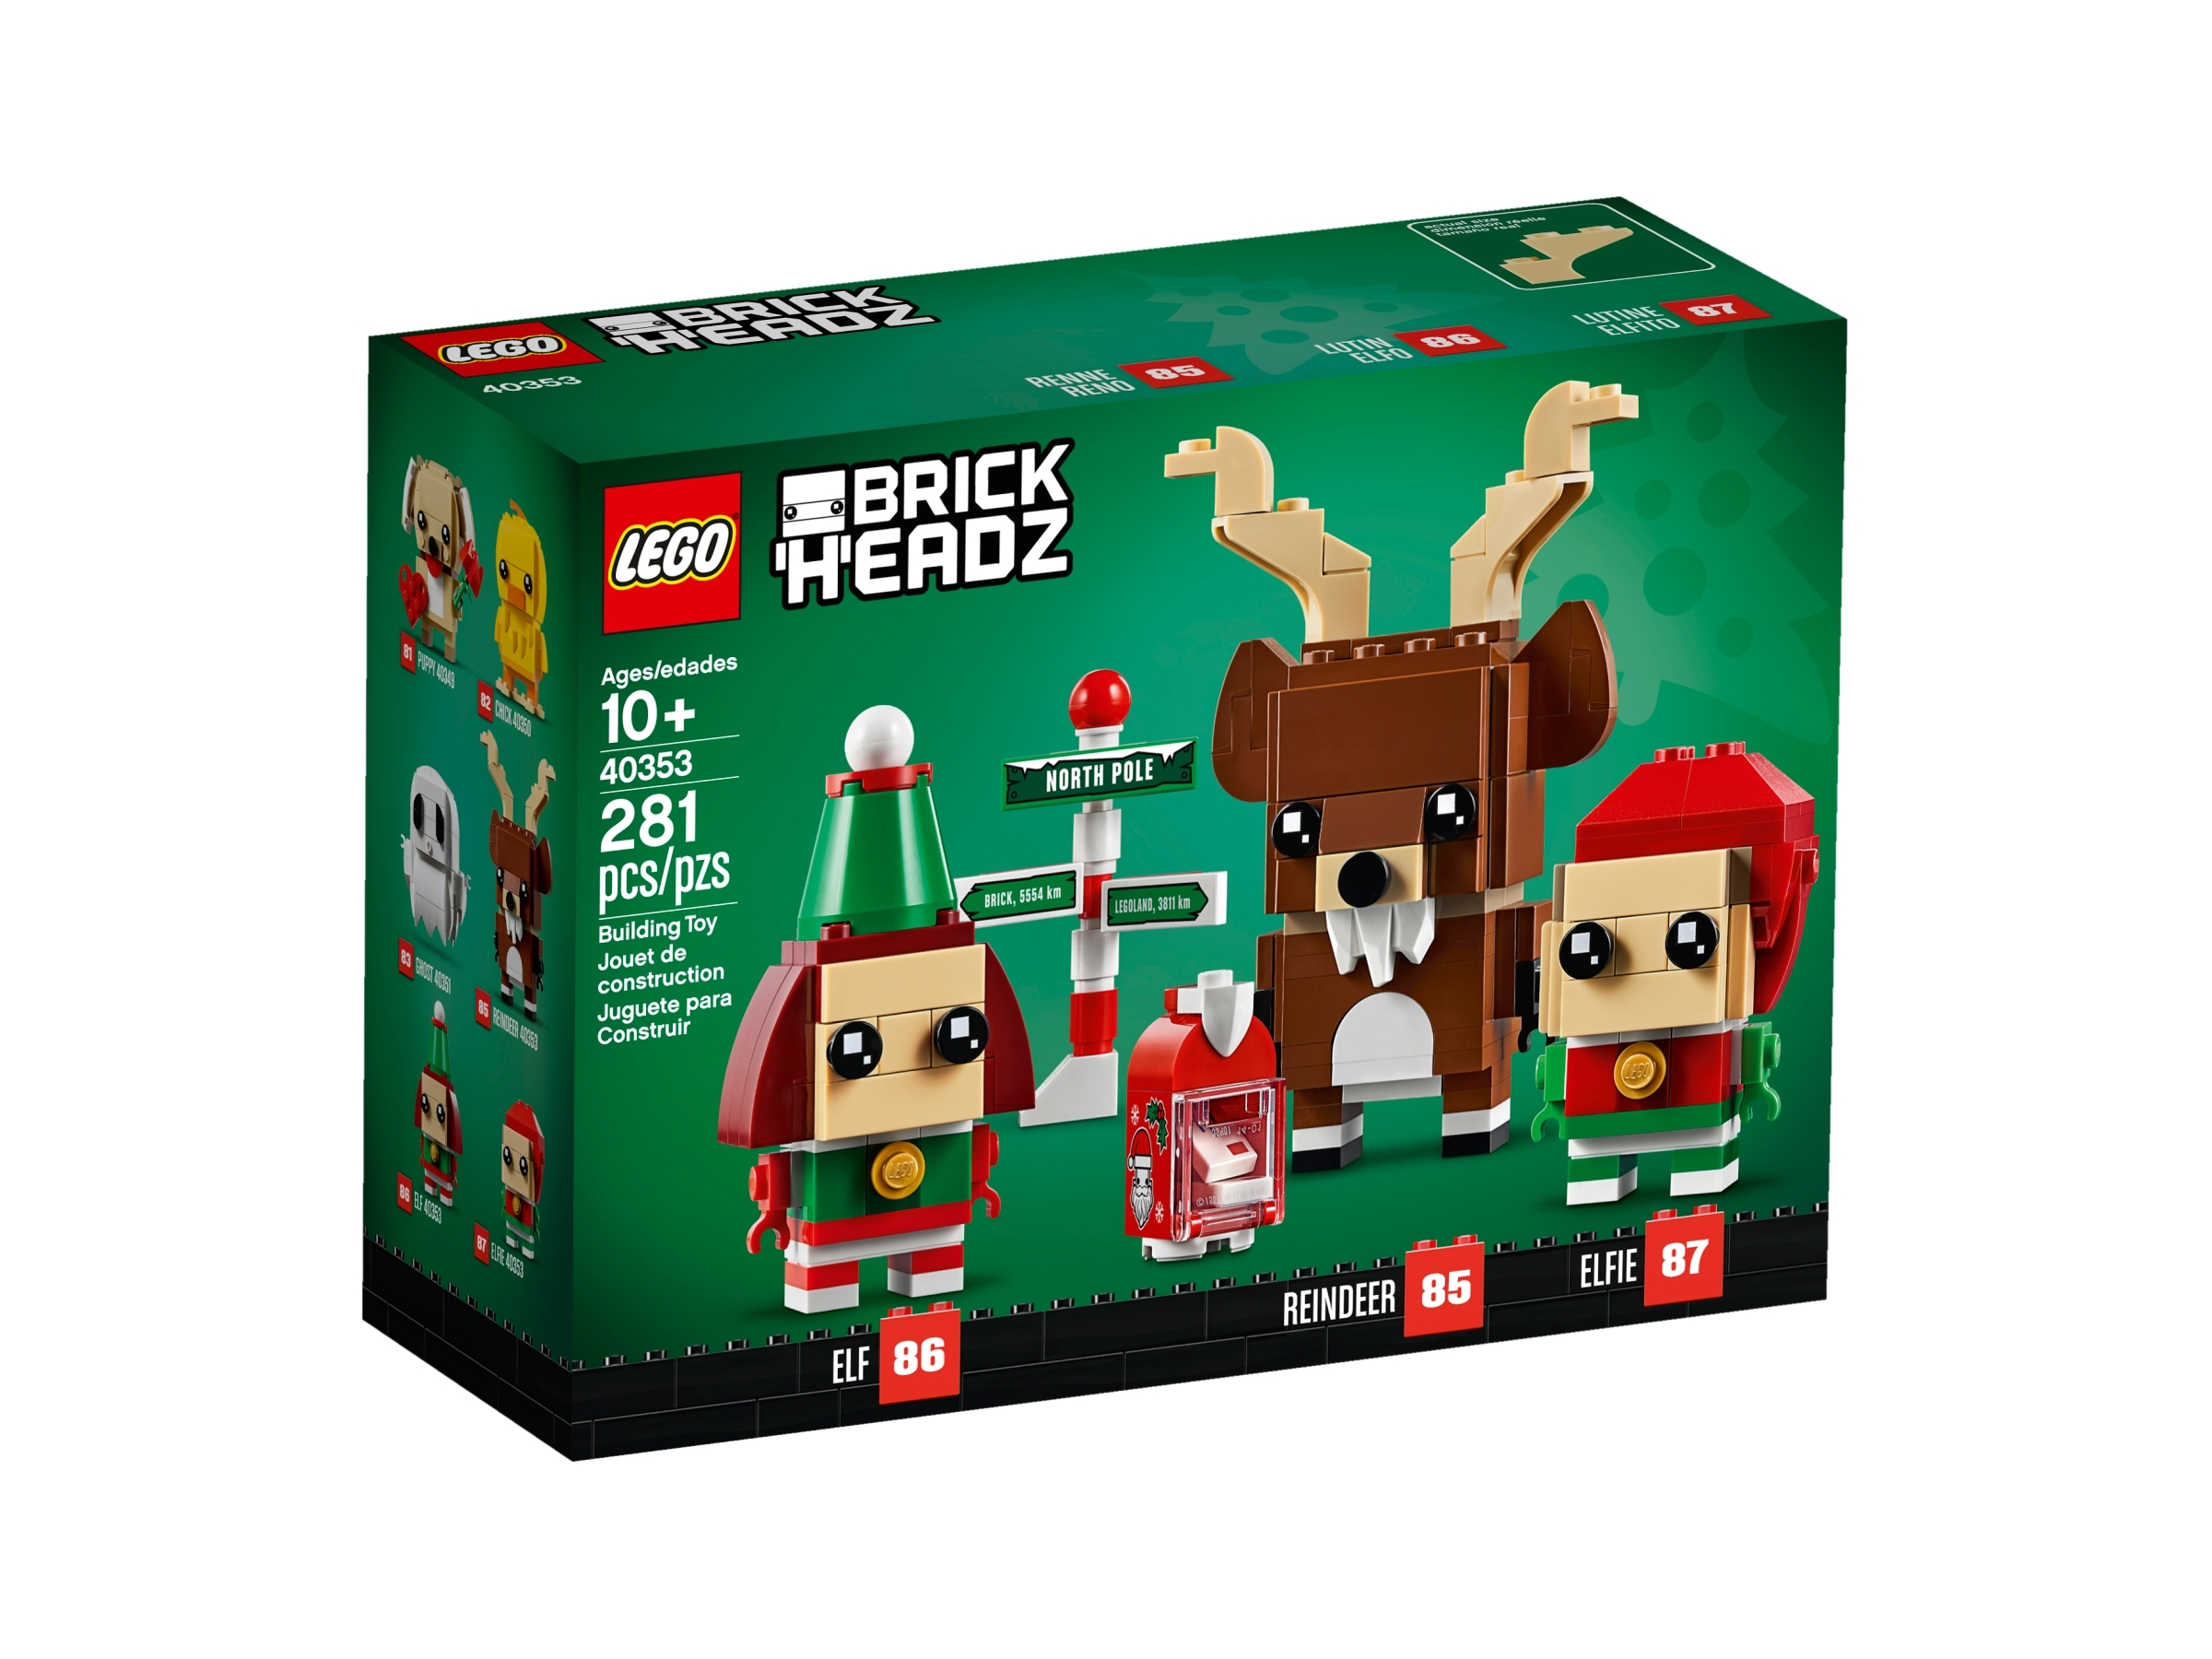 lego 40353 renifer elf i elfka